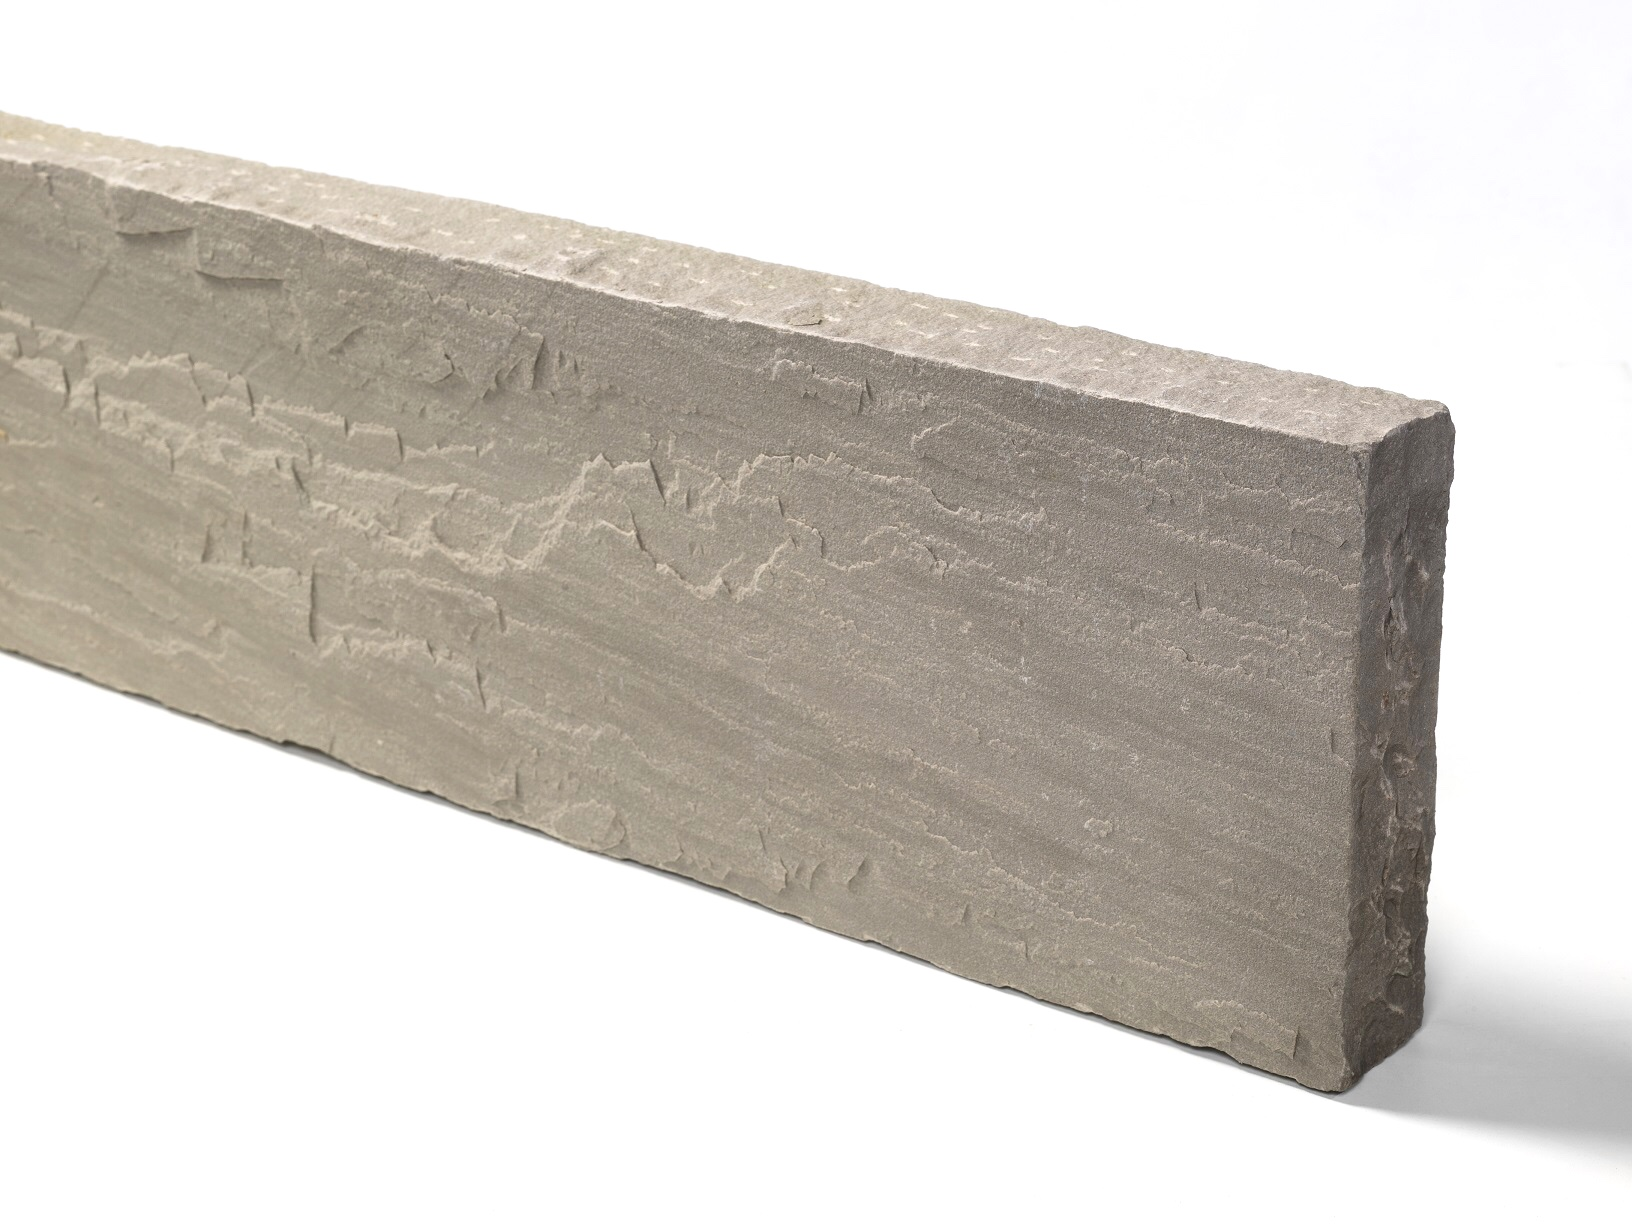 Quarz-Sand Kantenstein 7-9x25x100 cm grau